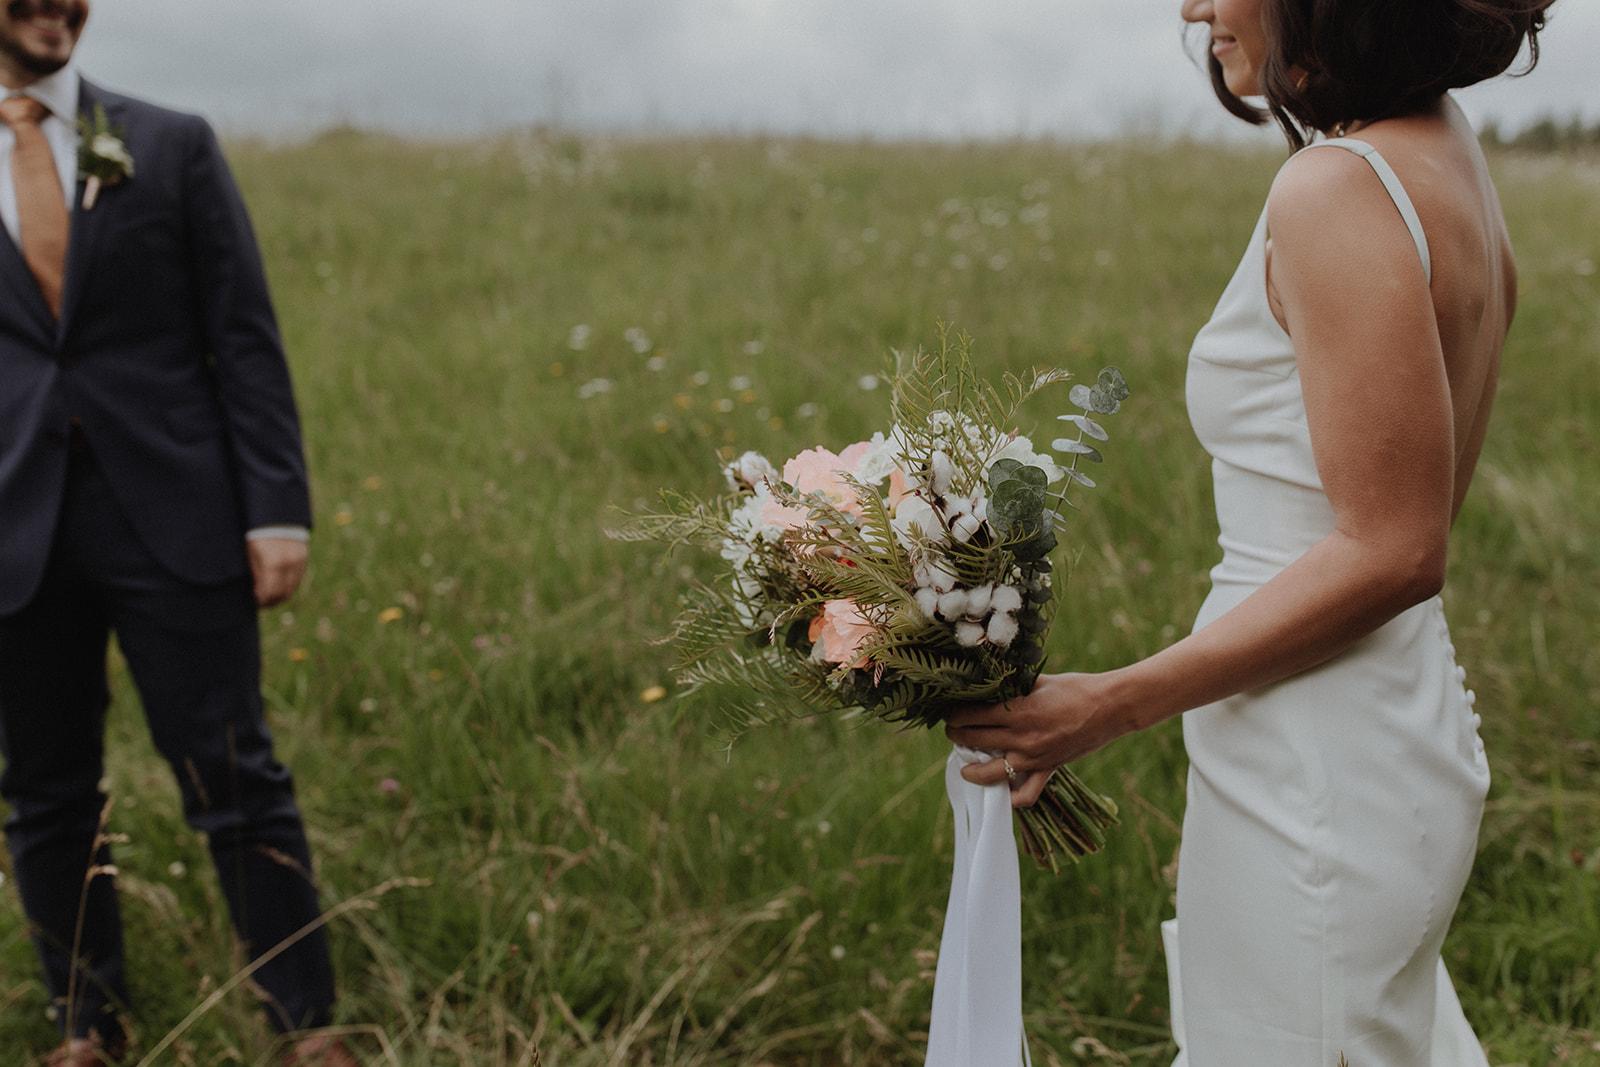 cortney_skye_wedding_june2019-104.jpg